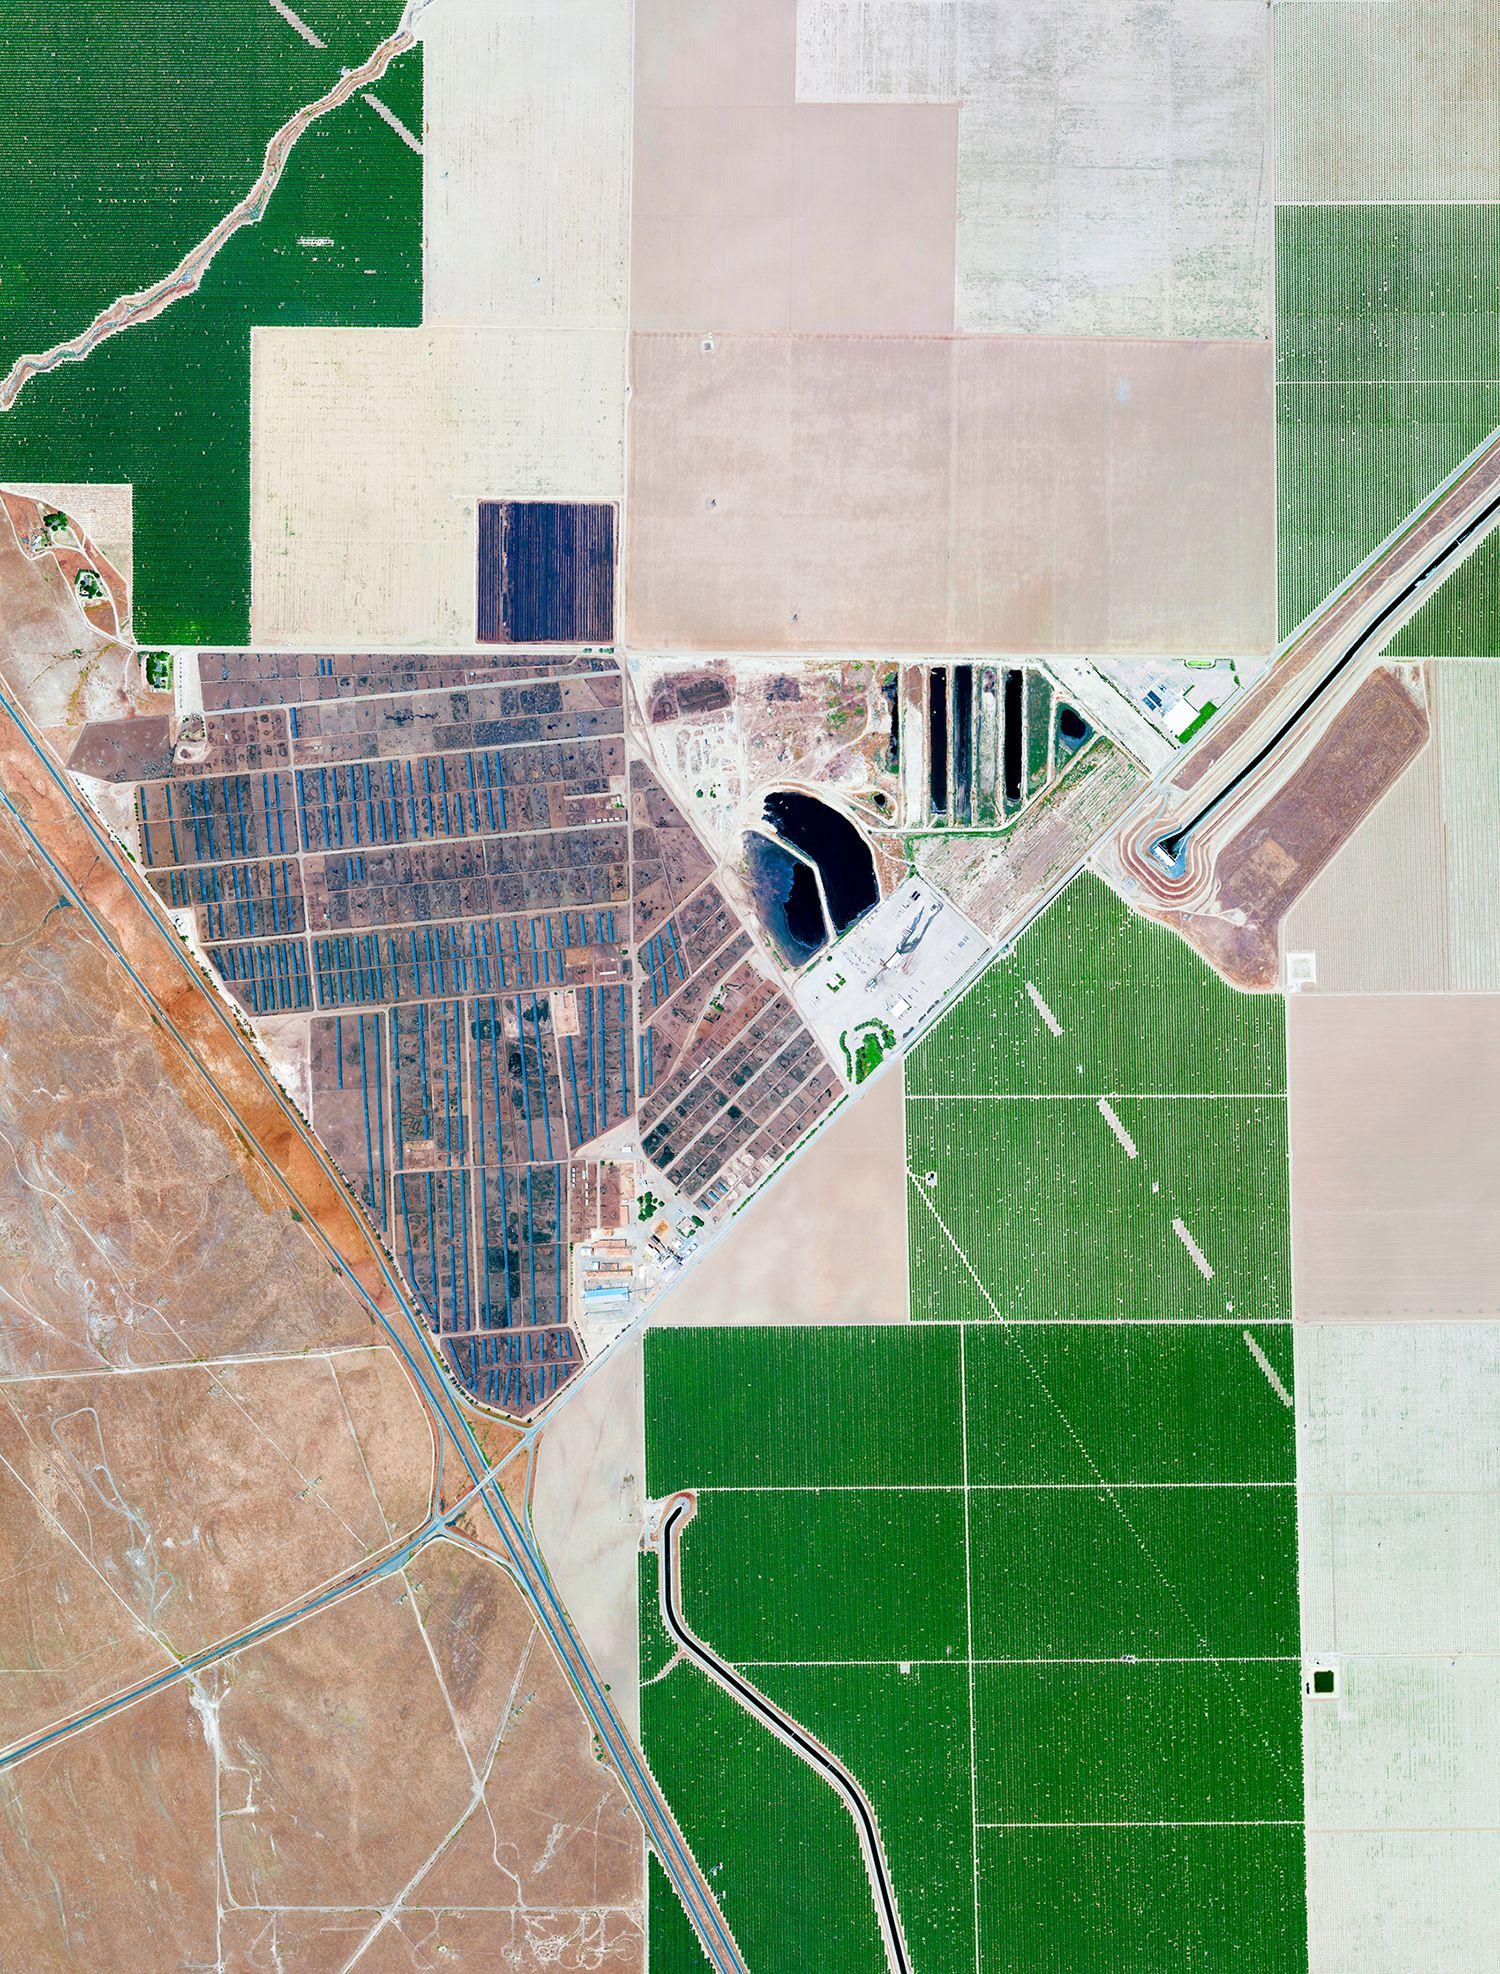 5292017 harris cattle ranch san joaquin valley in california 36305402